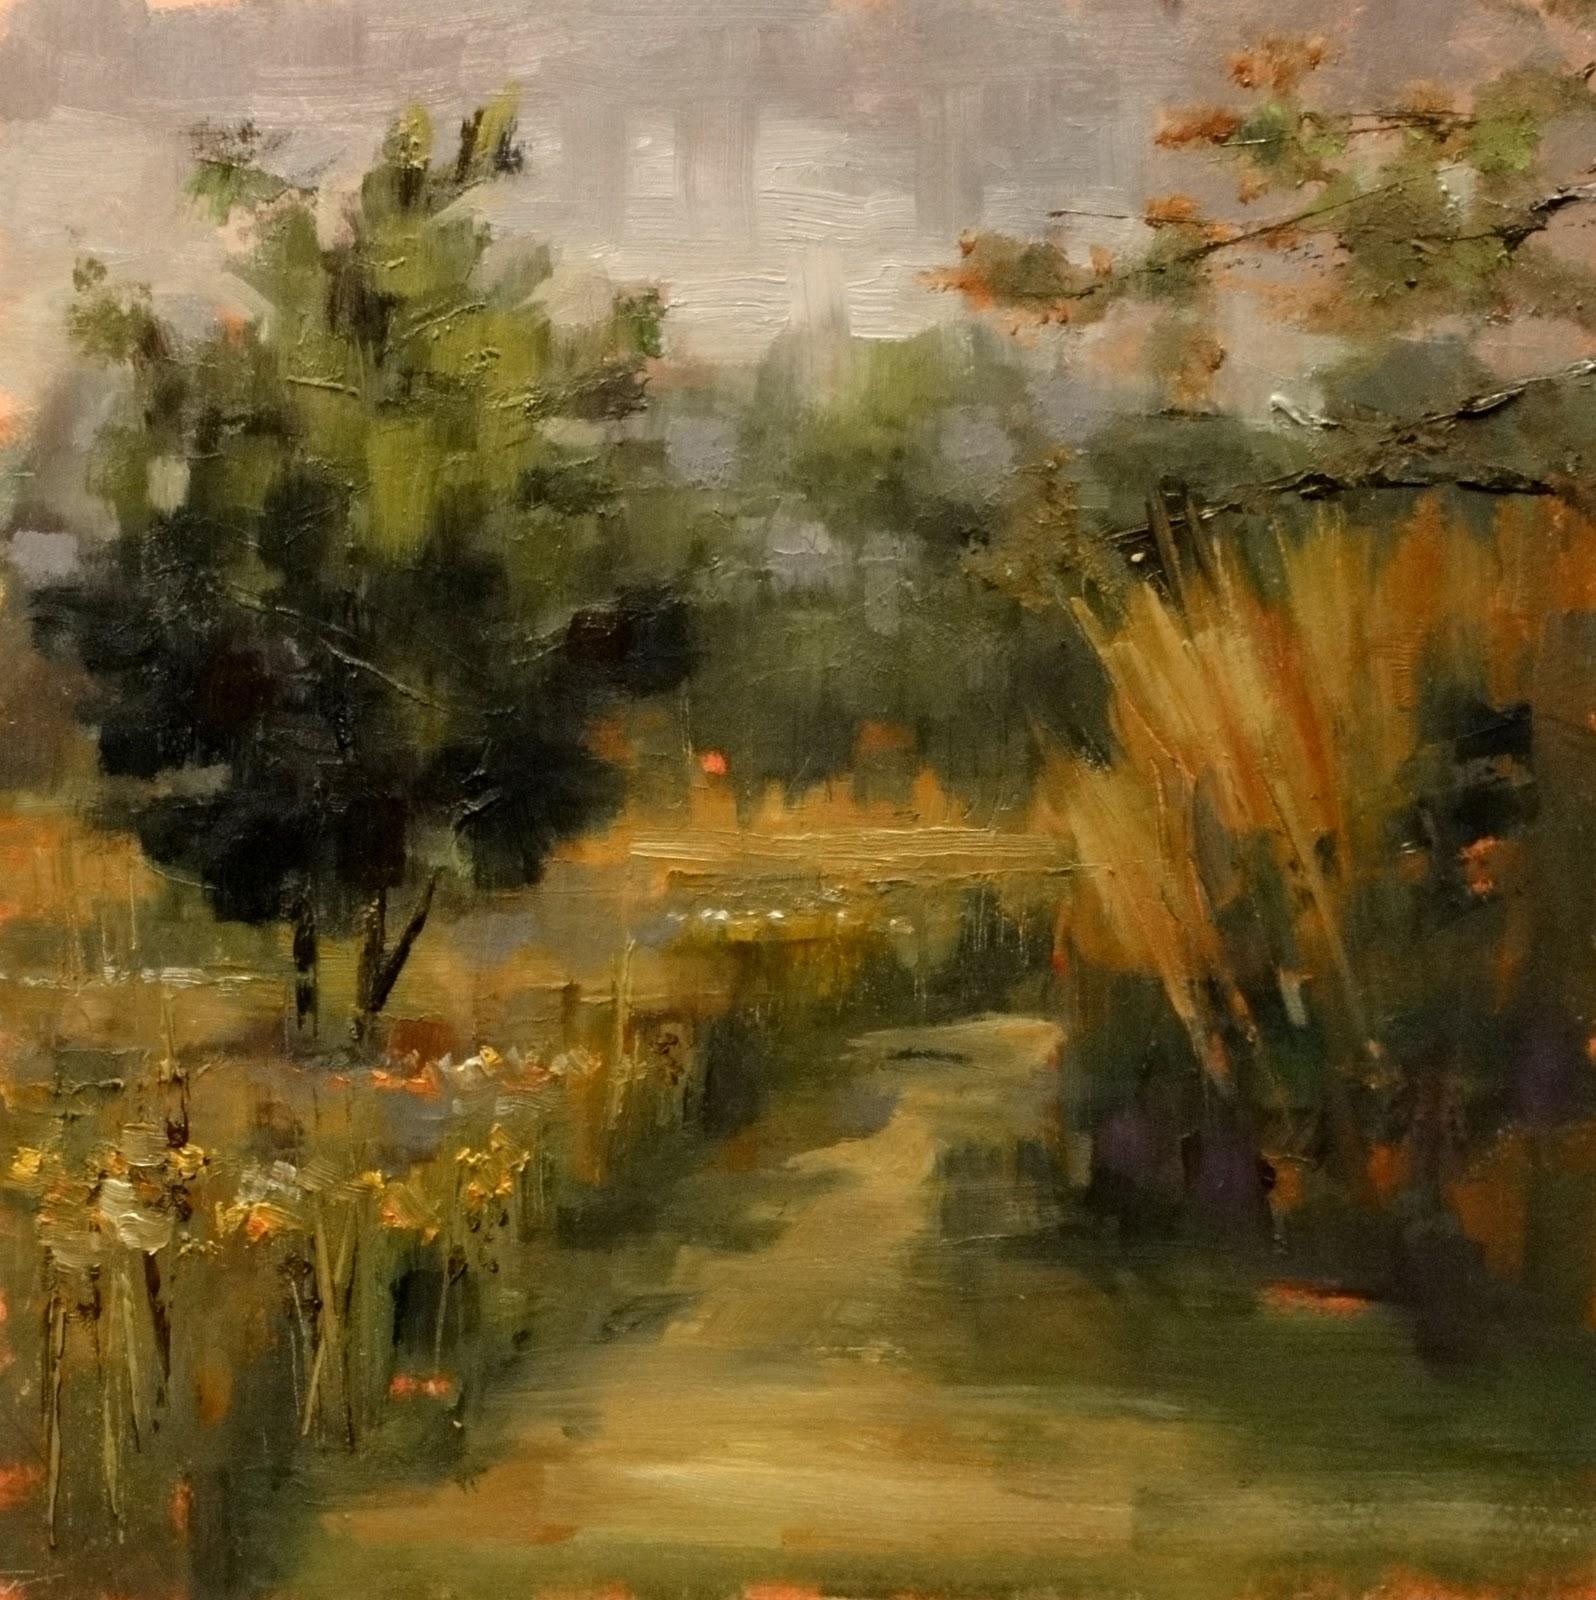 """Rain in the Woods, 8x8"" original fine art by Ann Feldman"